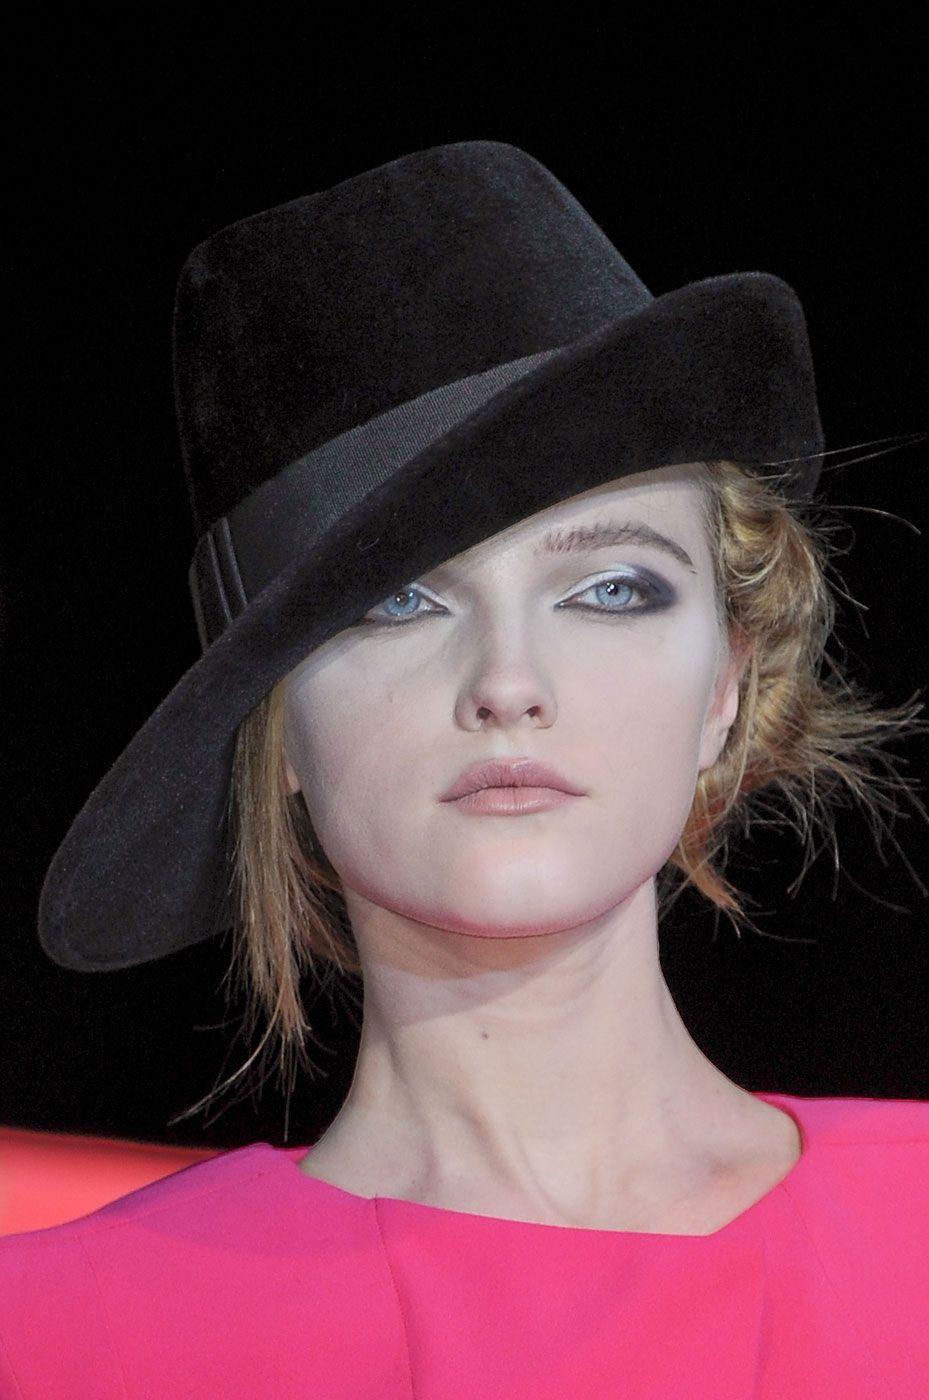 hats   Fall/ Winter 2012-2013 Hat Trends - Cloche Hats